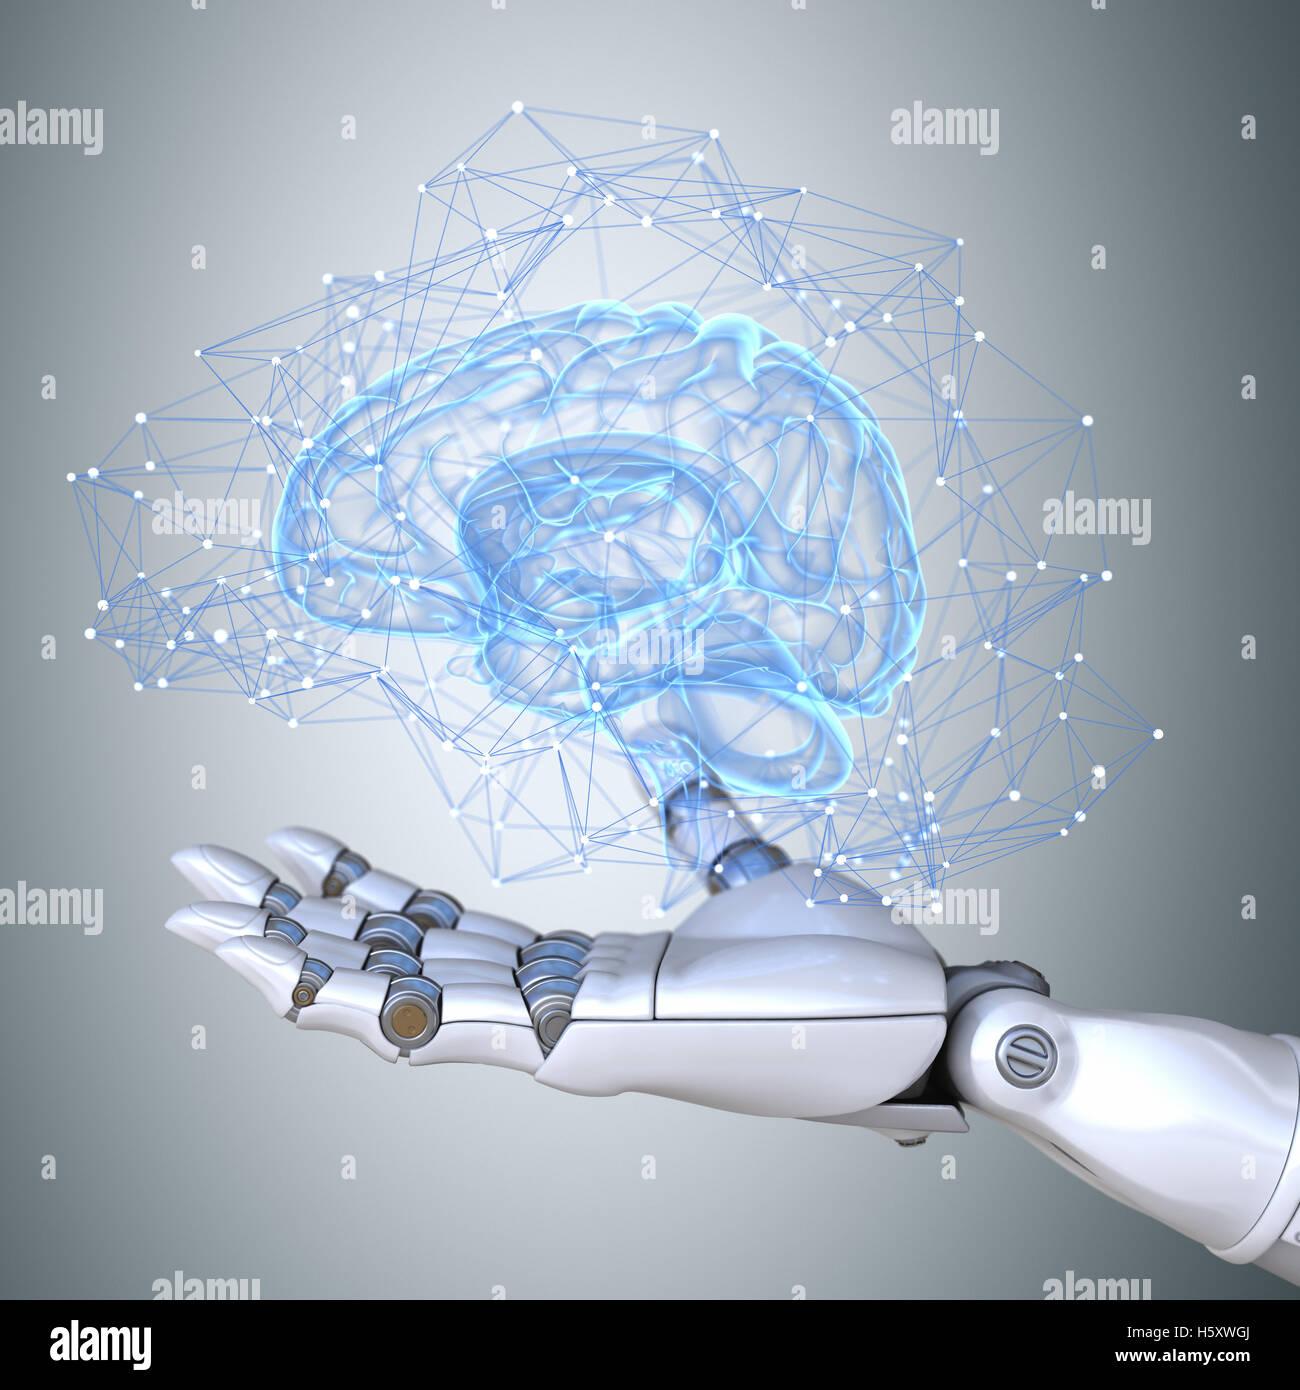 Robot hand holding virtual brain scheme - Stock Image